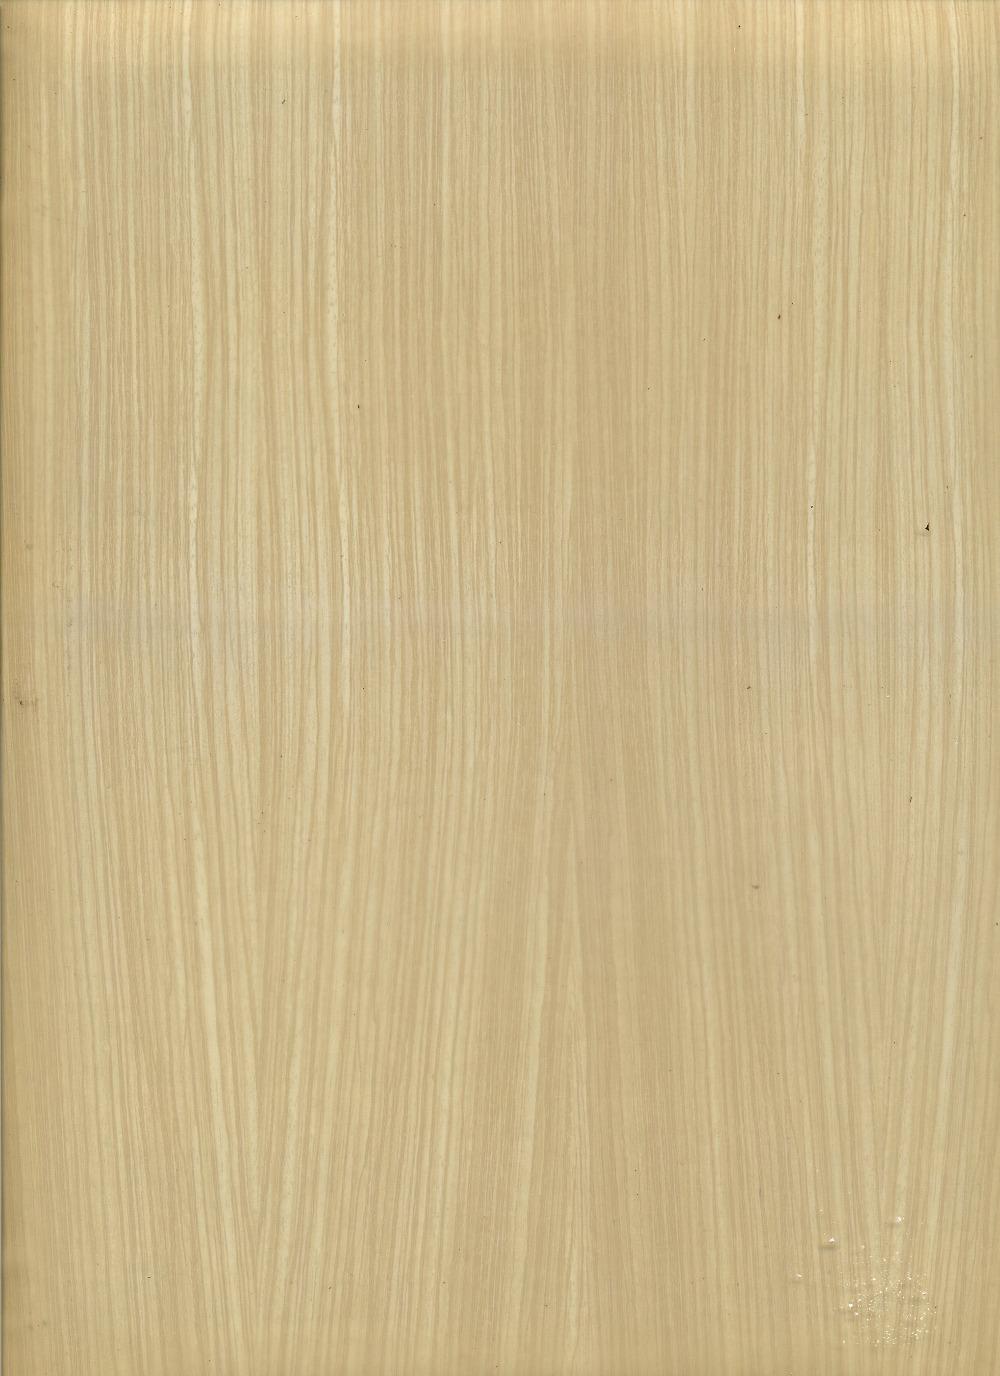 hydro dipping stright wood grain Water tranfer Printing,M-8404,Hydrographic FILM,Aqua Print for furniture(China (Mainland))